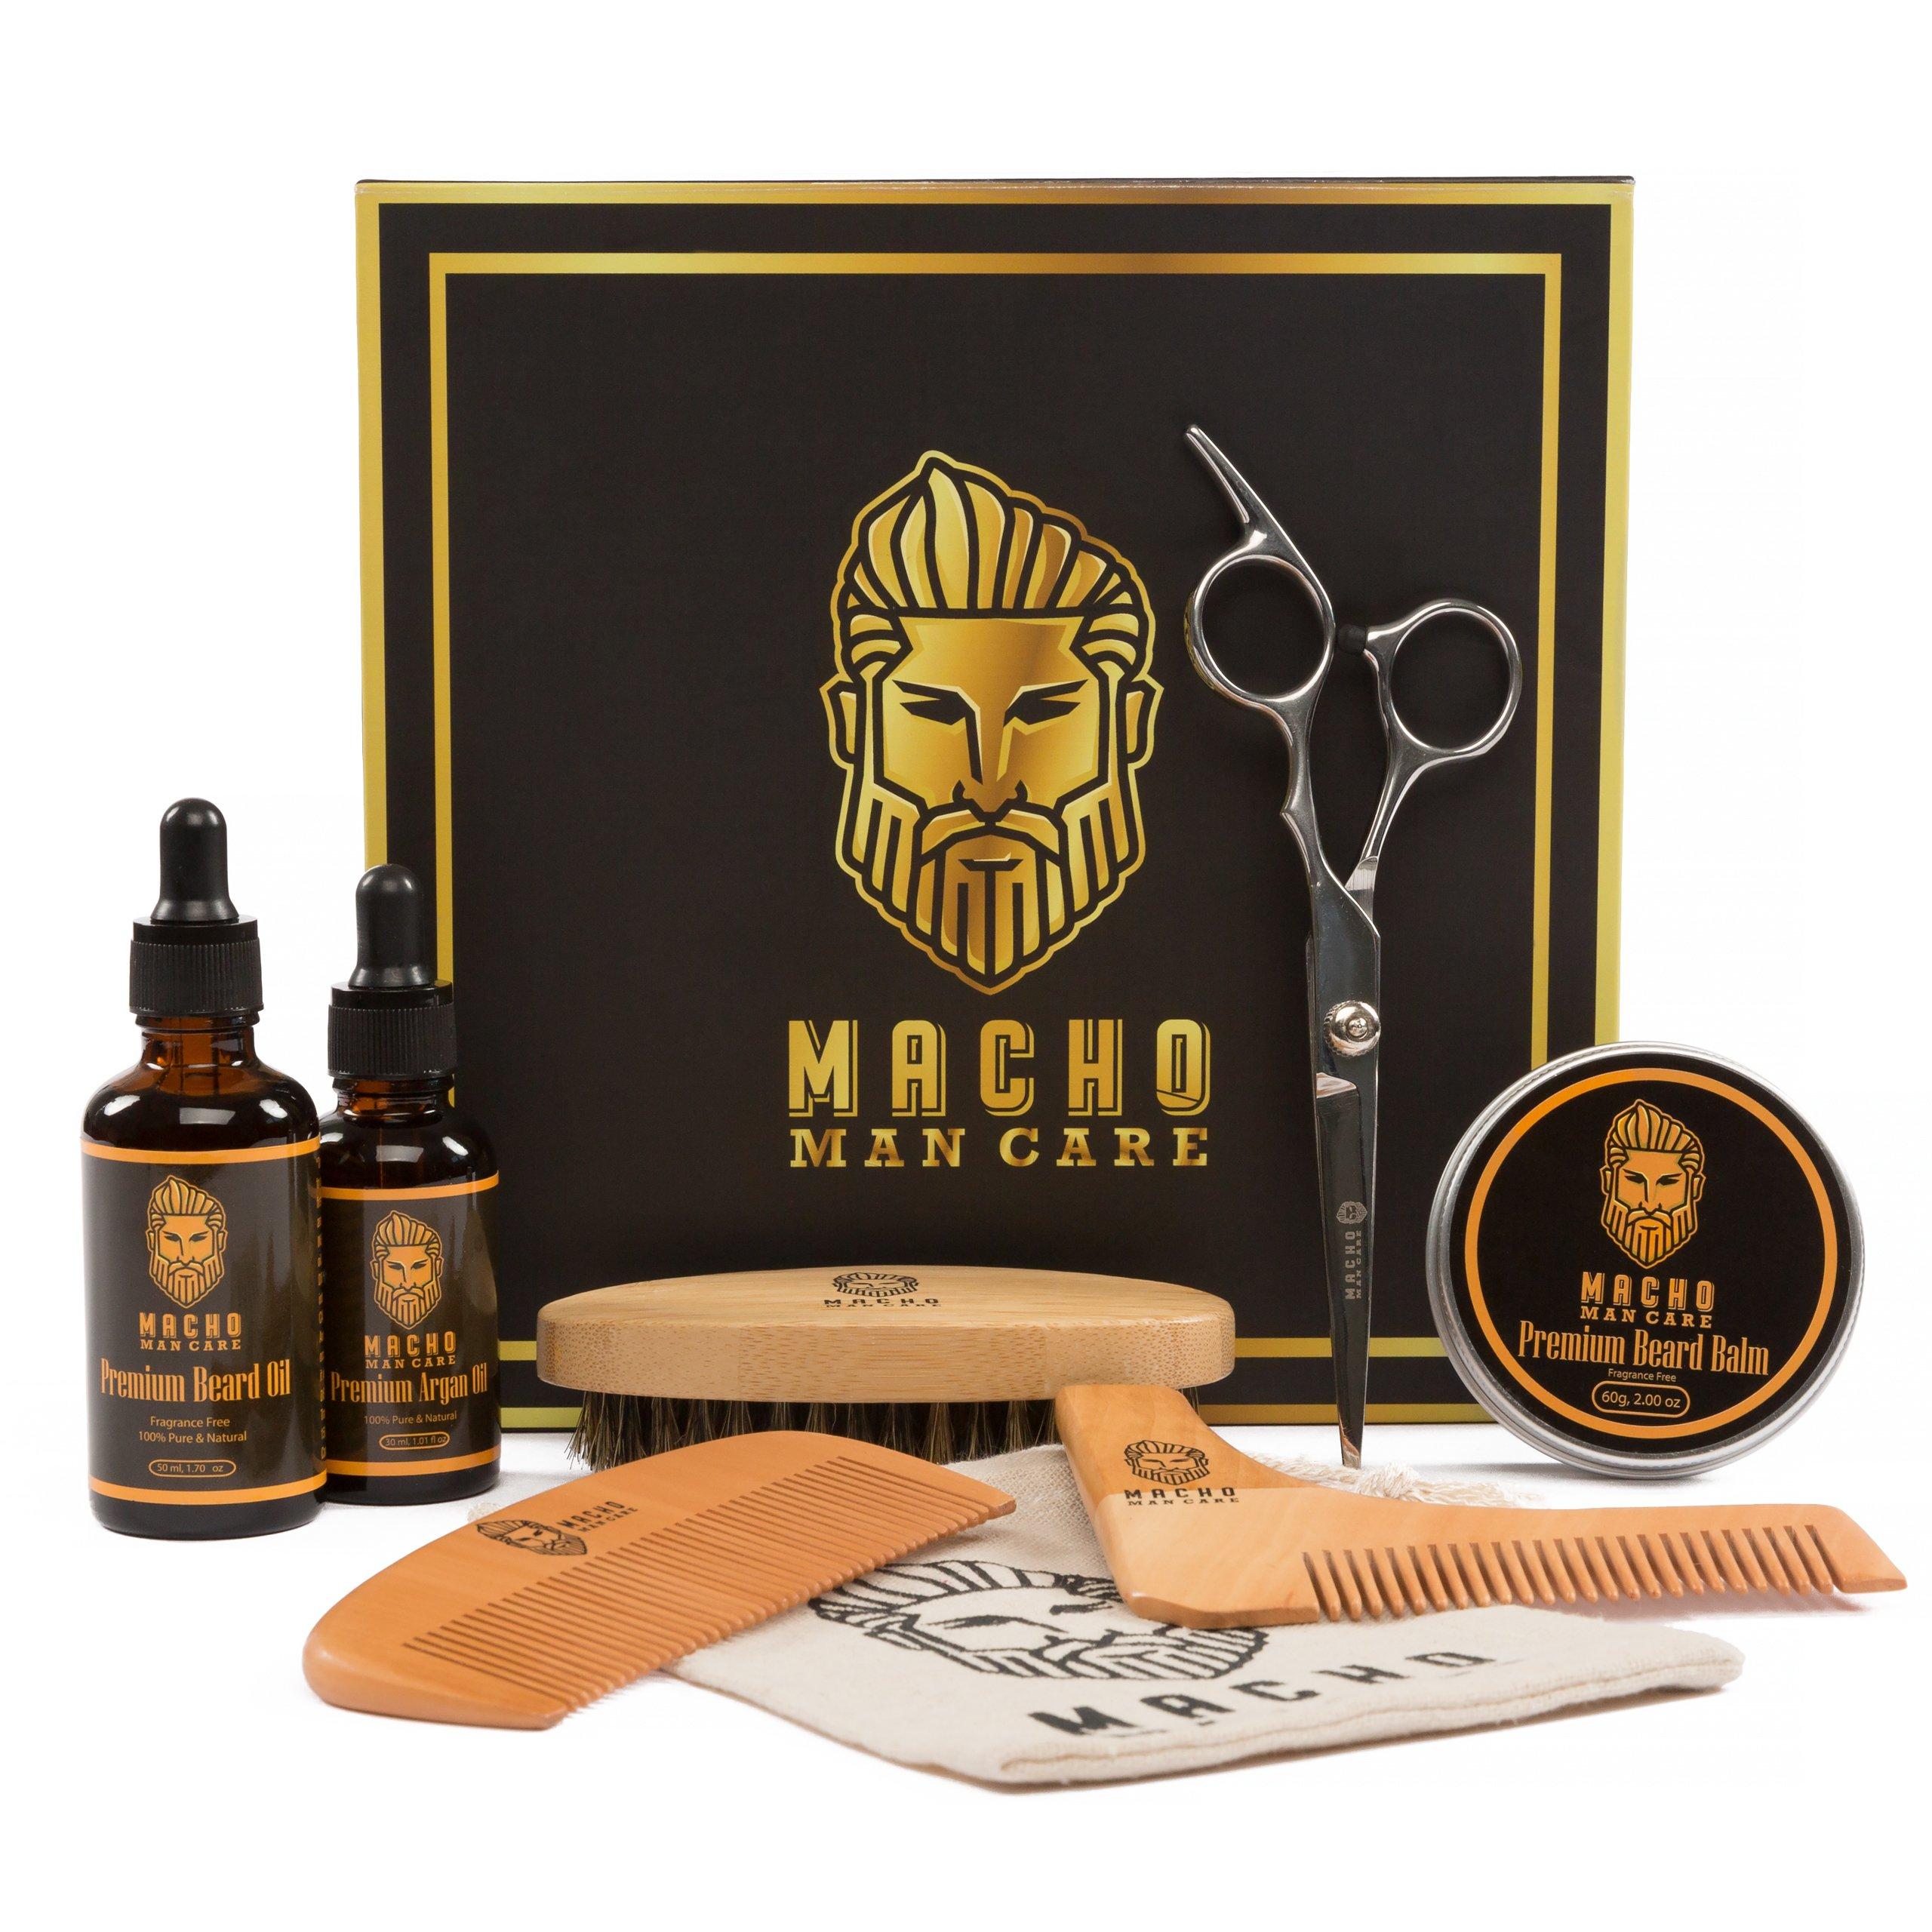 Deluxe Beard Grooming Kit - Beard Brush, Beard Oil for Men, Beard Comb, Beard Balm, Mustache Scissors, Beard Shaping Tool, Argan Oil - Luxurious Best Mens Trimming and Maintenance Beard Care Kit